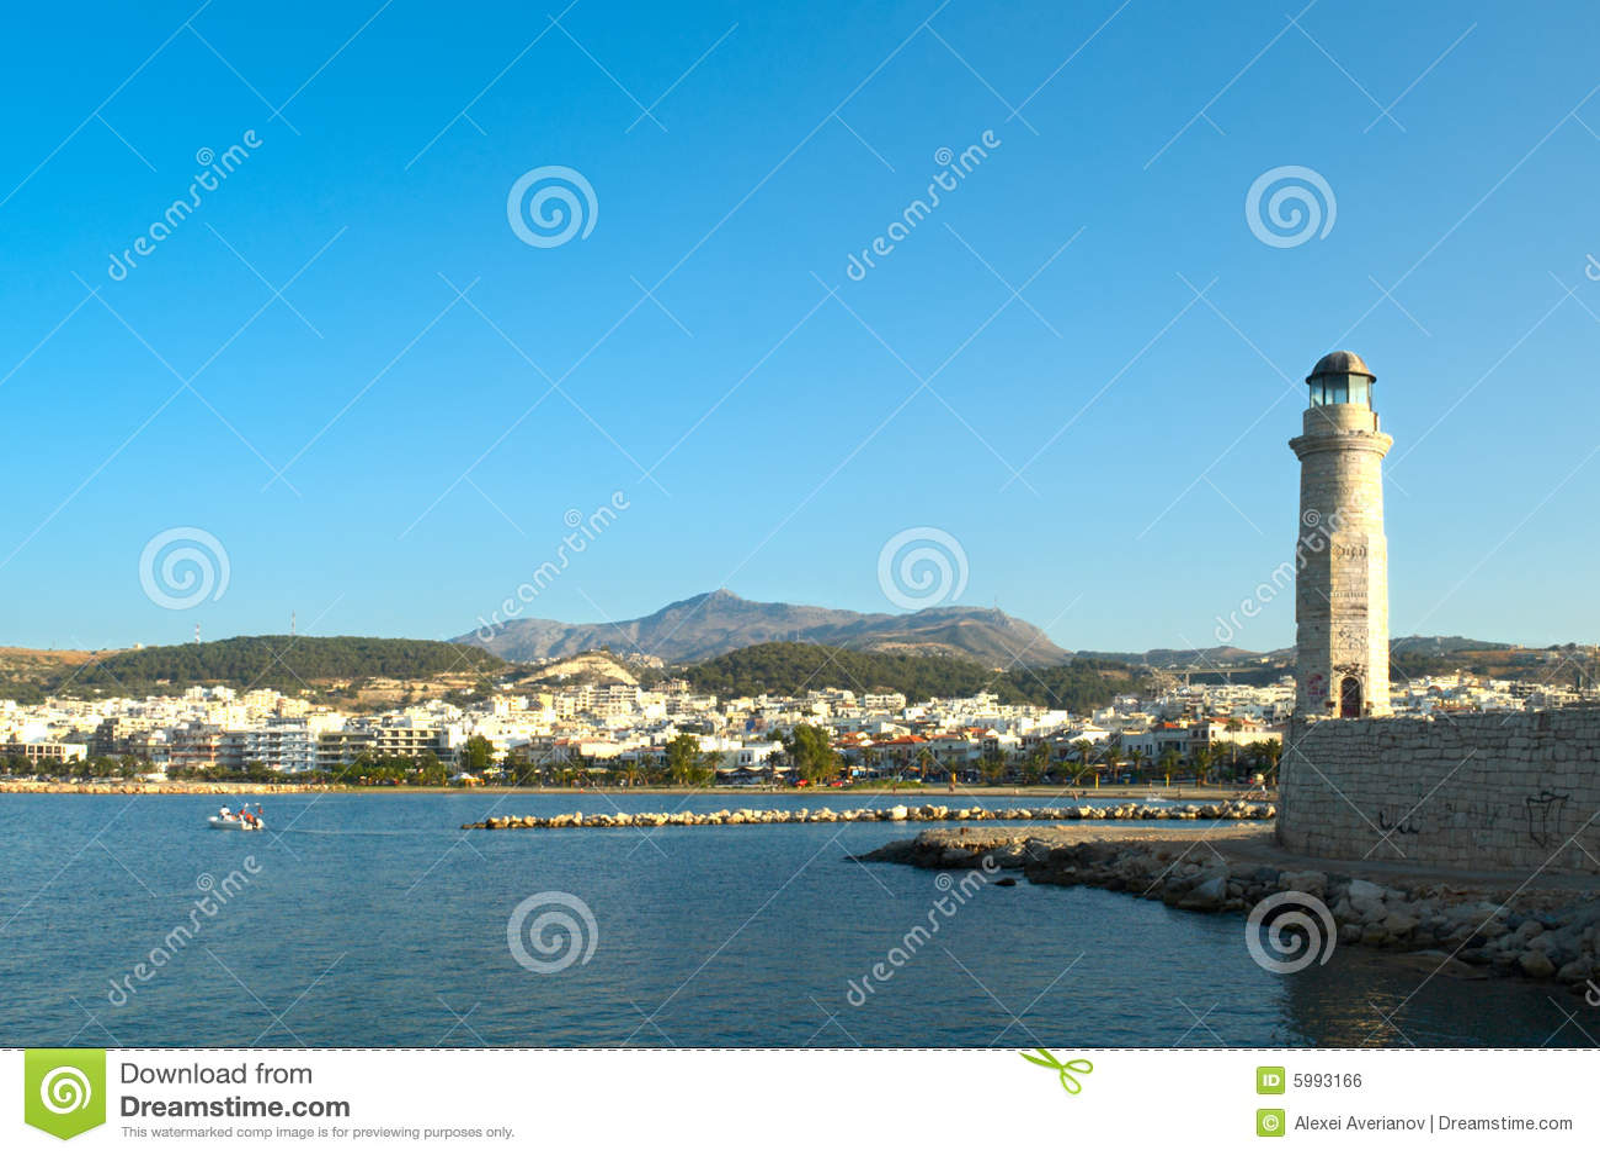 De baai van Rethymno. Kreta.